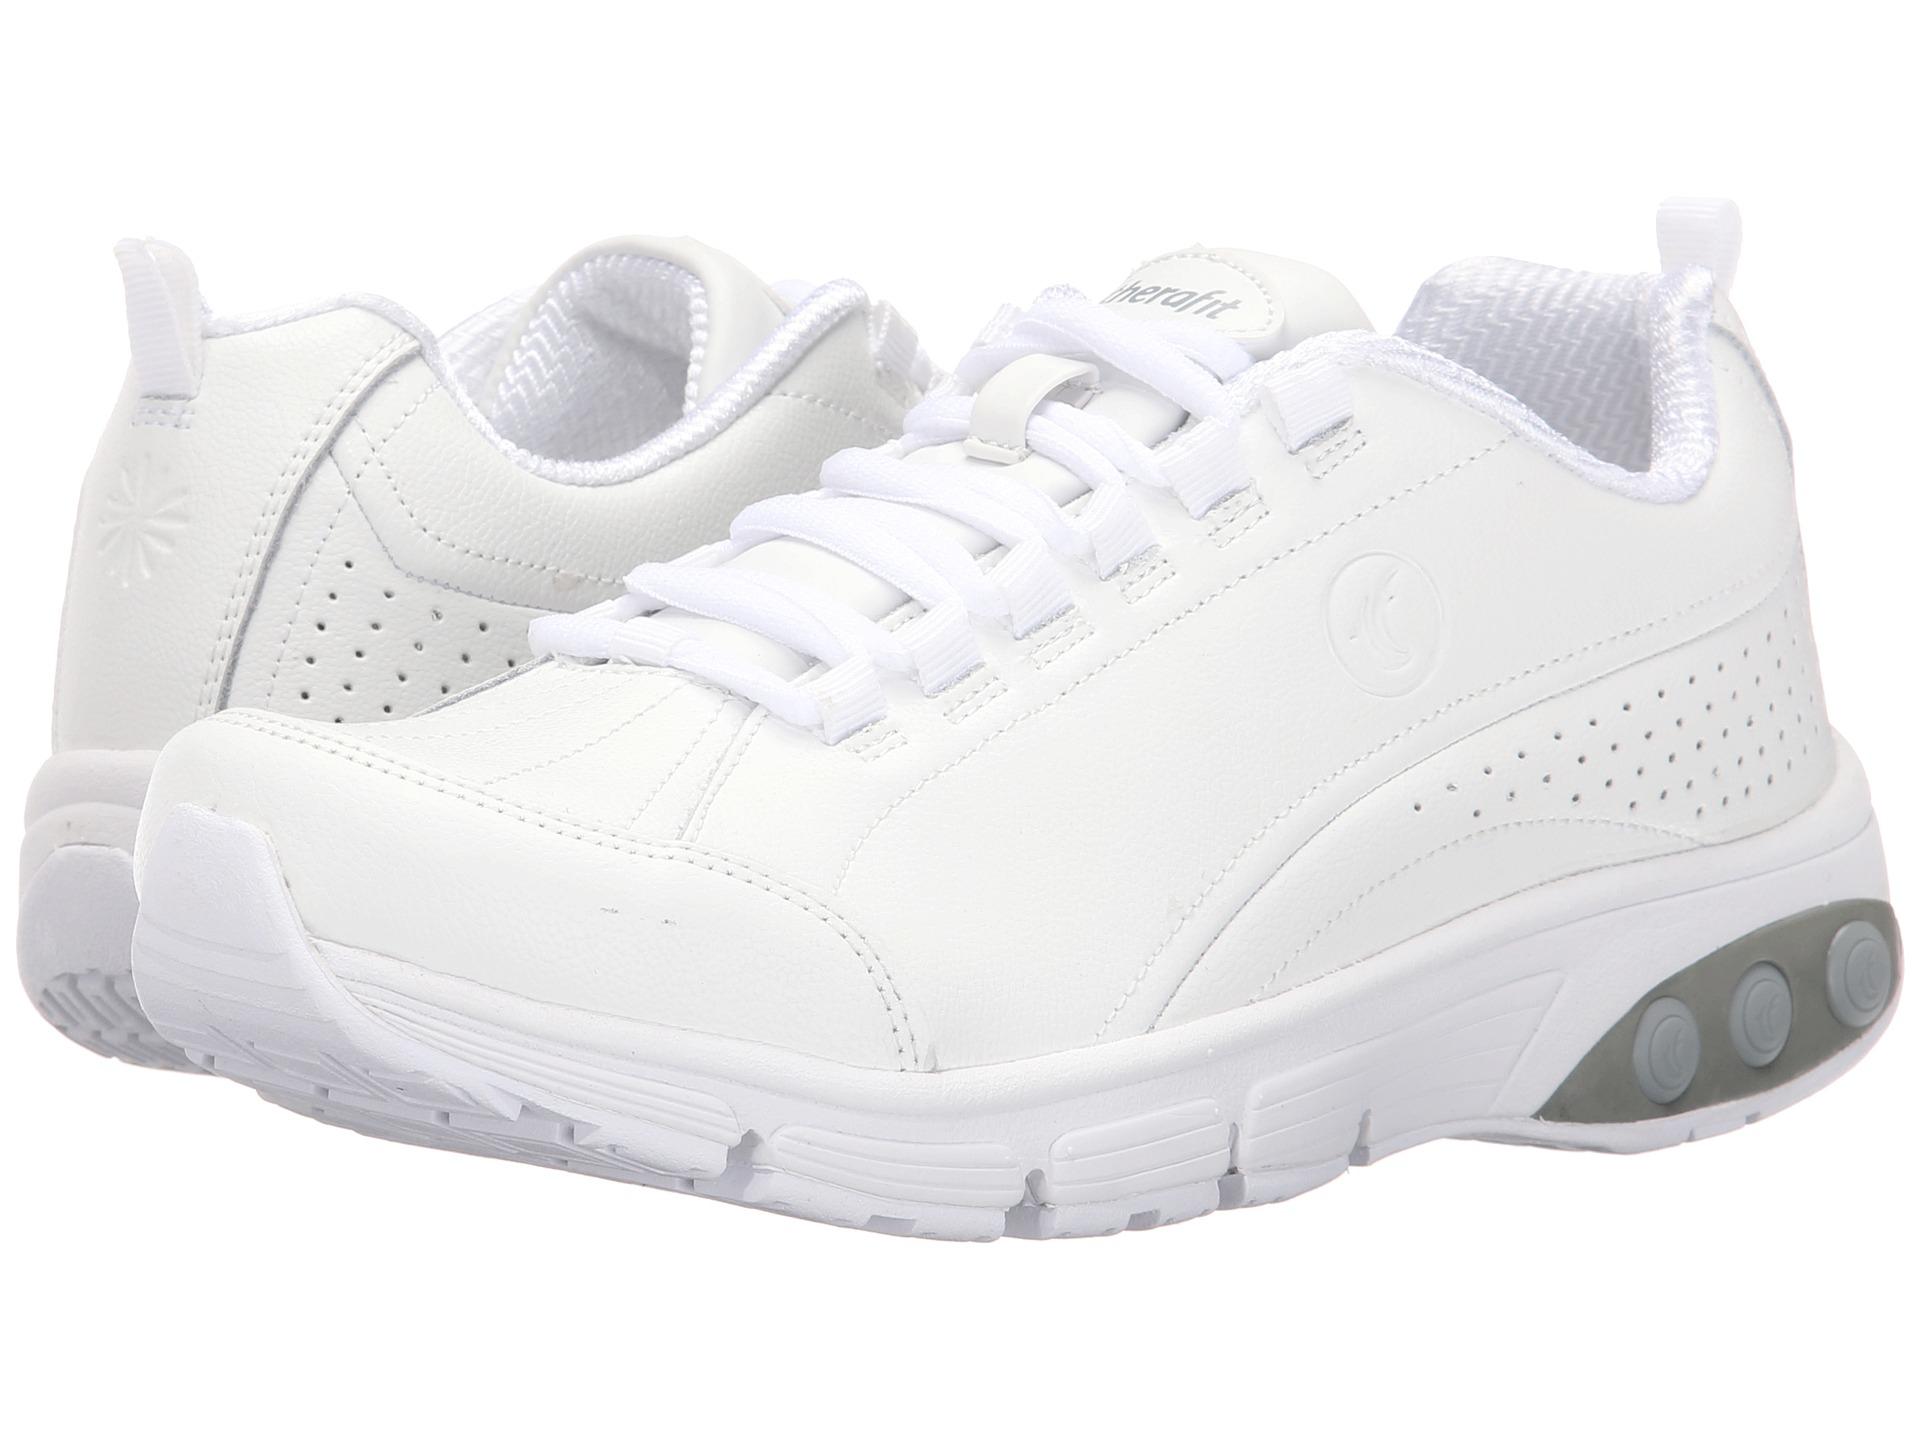 Lyst - Therafit Kathy Non-slip in White